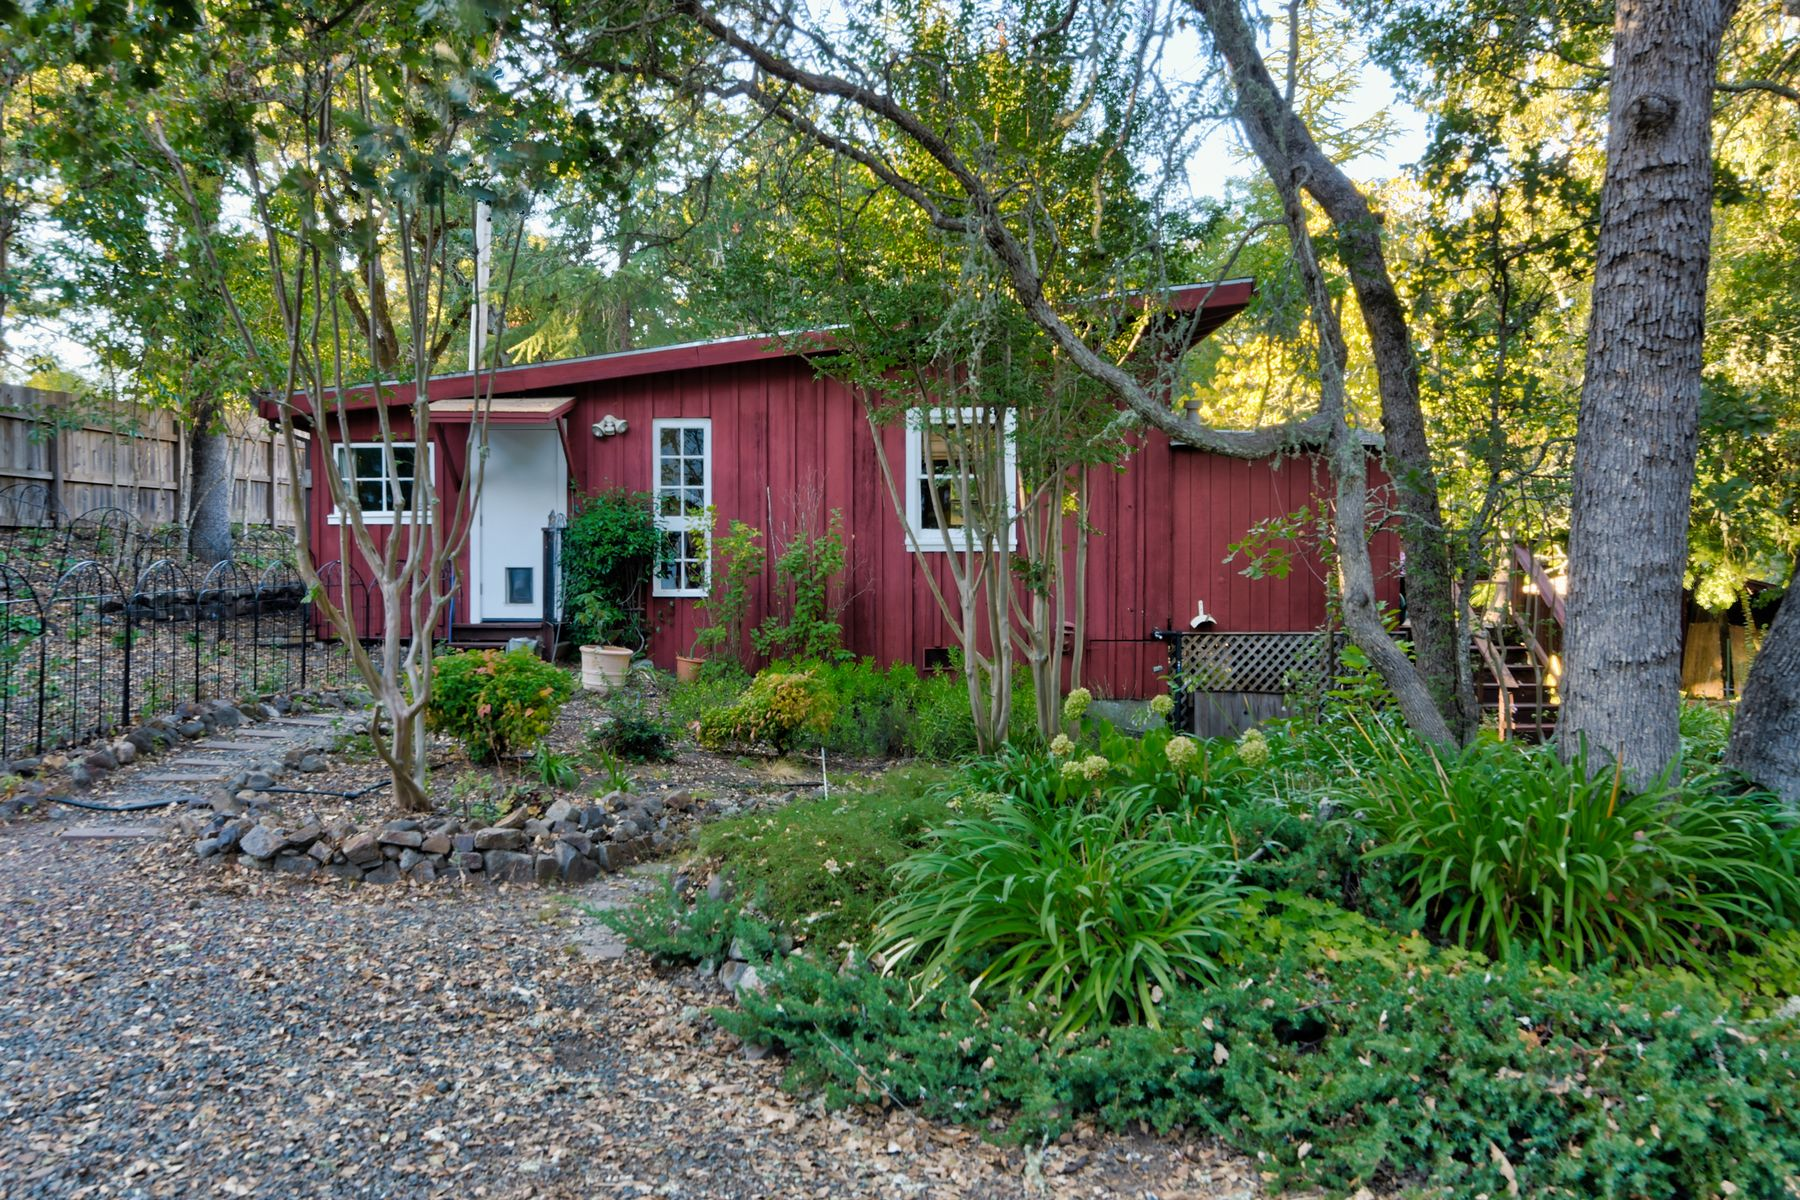 Single Family Homes for Sale at Jack London Estates Farmhouse with Barn 4120 Lakeside Rd Glen Ellen, California 95442 United States